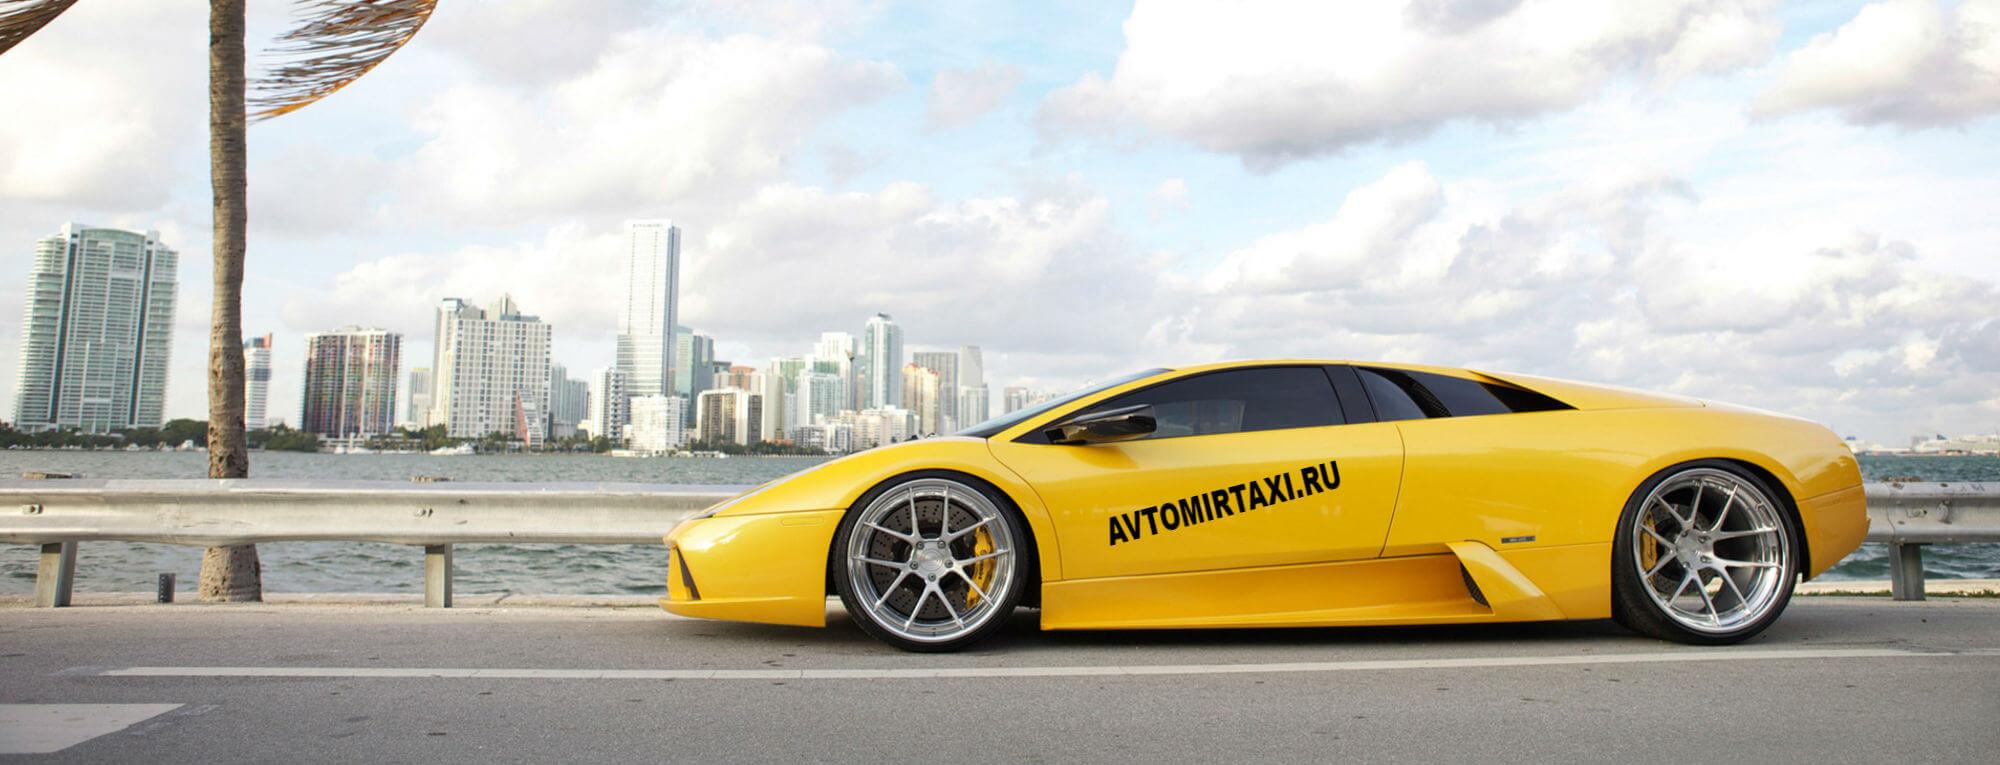 Автомир - услуги для такси